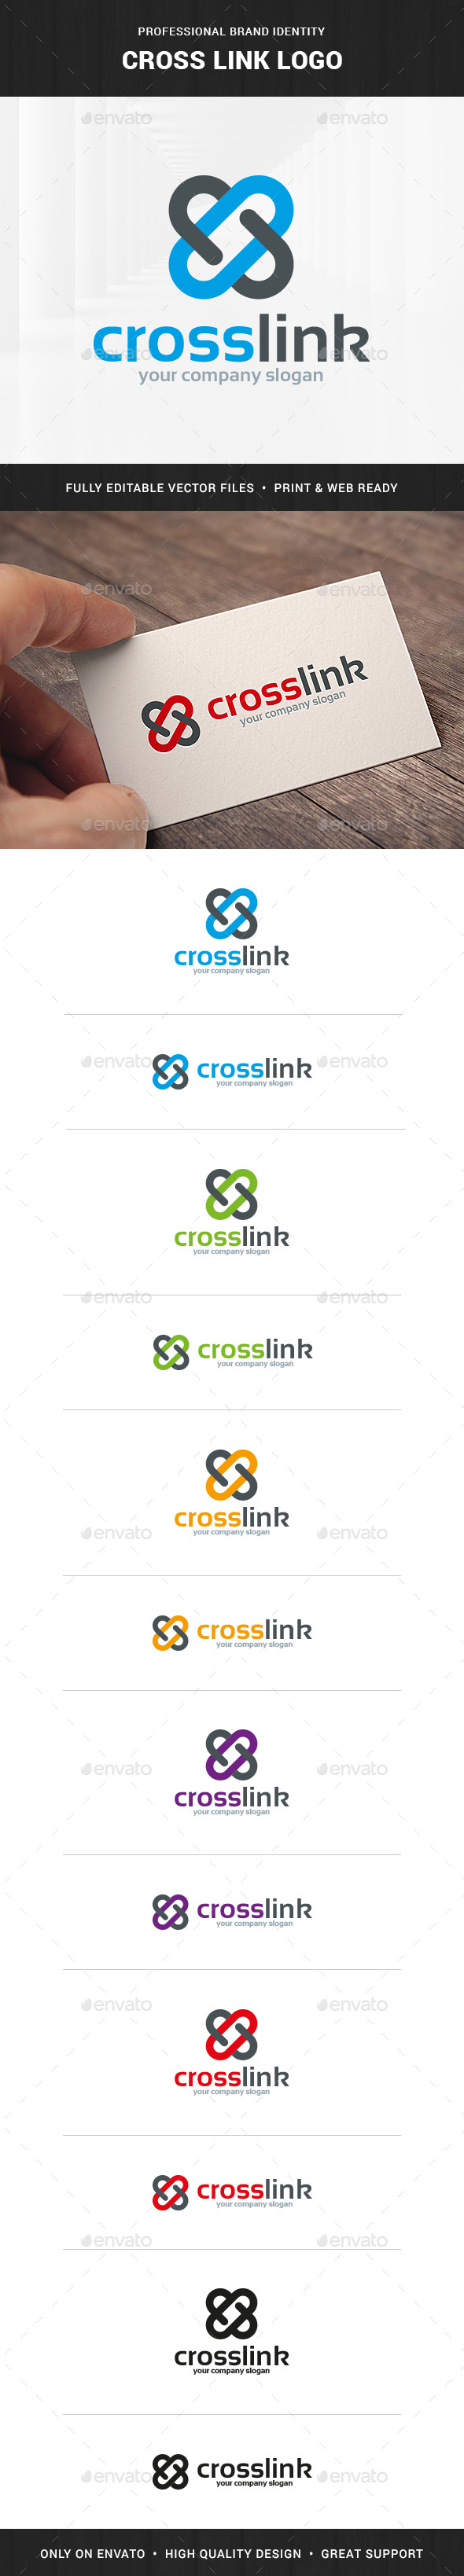 Cross Link Logo Template - Abstract Logo Templates